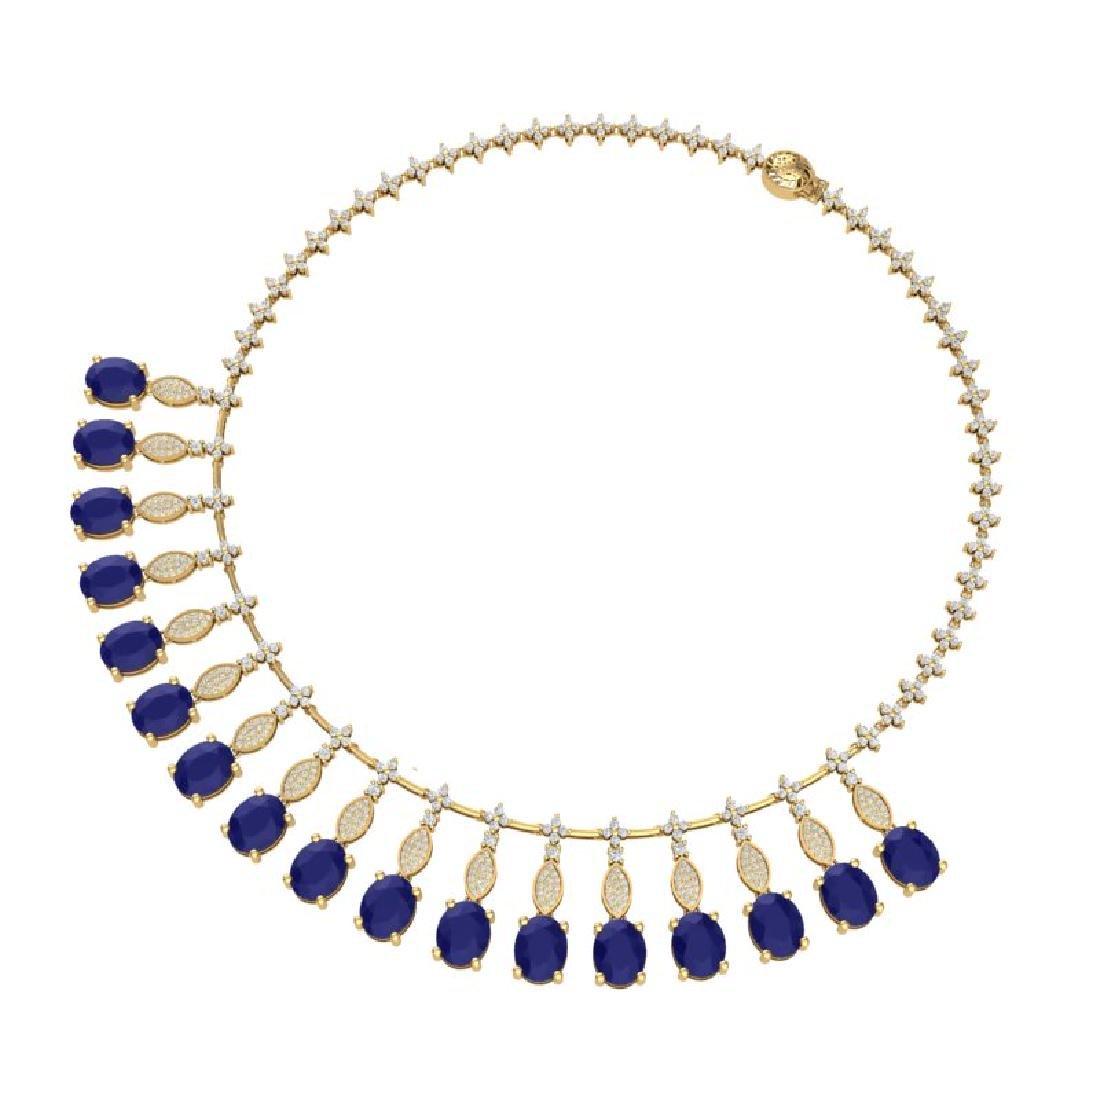 65.62 CTW Royalty Sapphire & VS Diamond Necklace 18K - 3